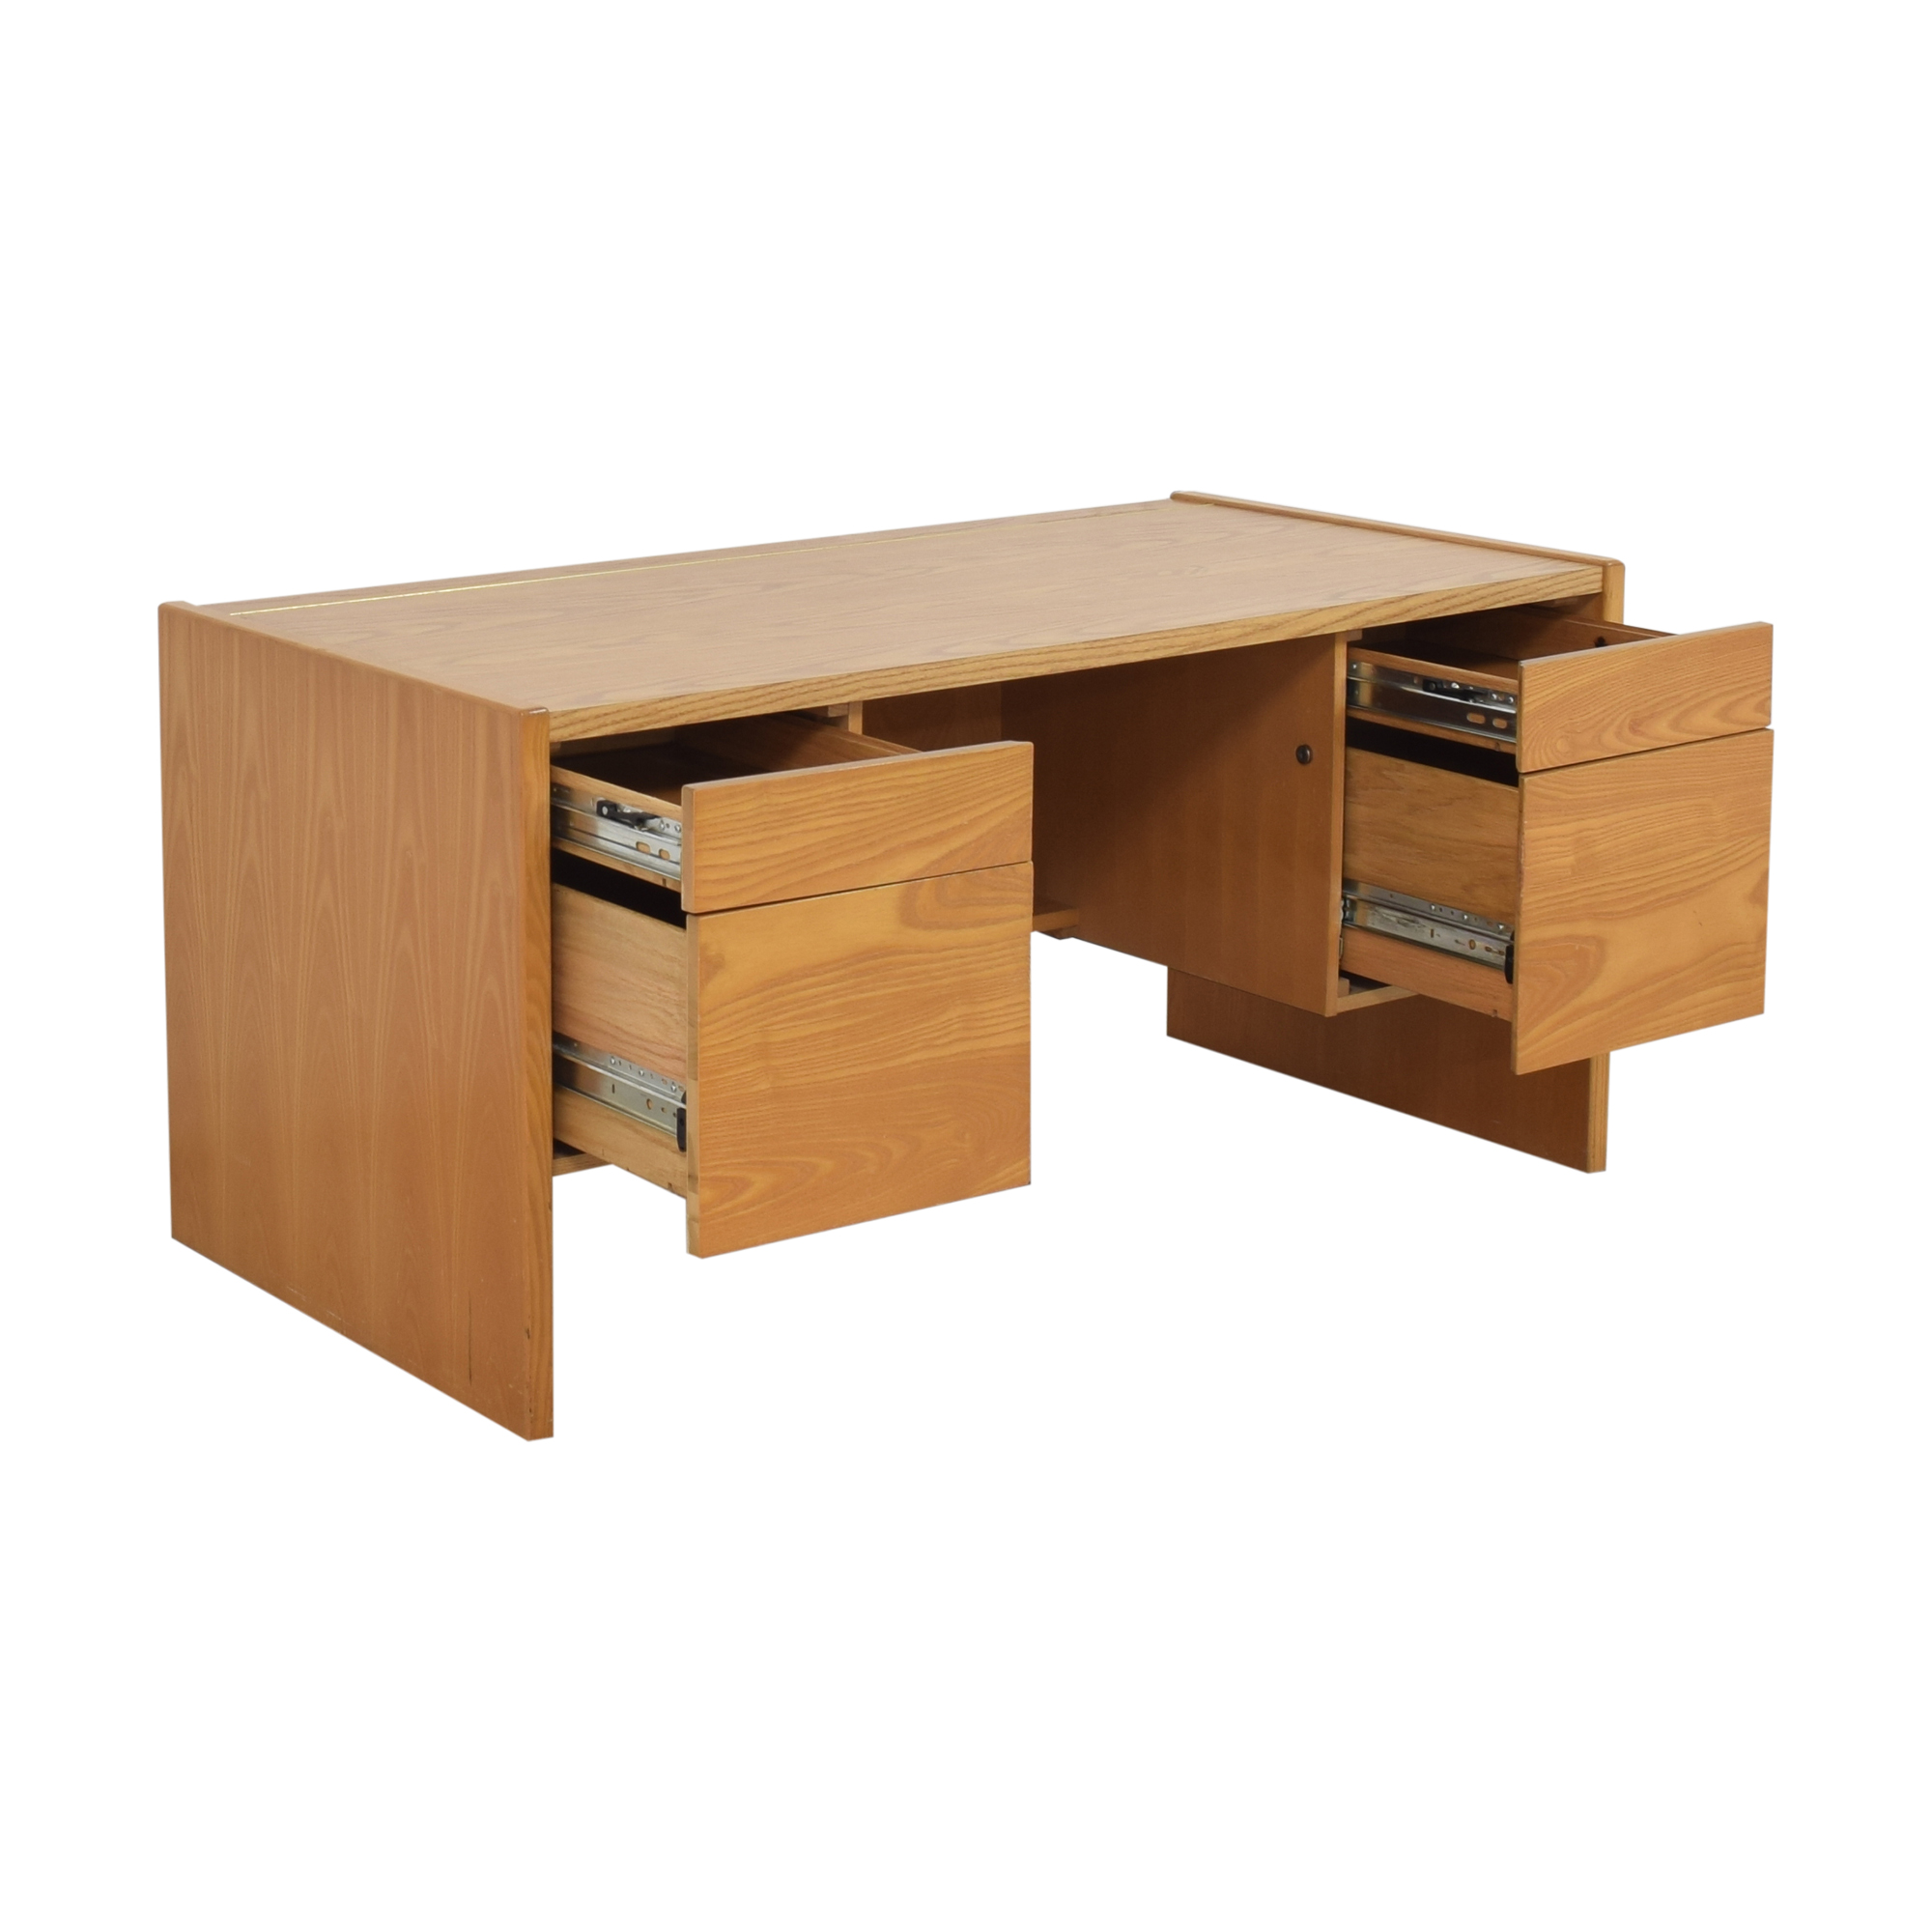 Boling Executive Desk Boling Furniture